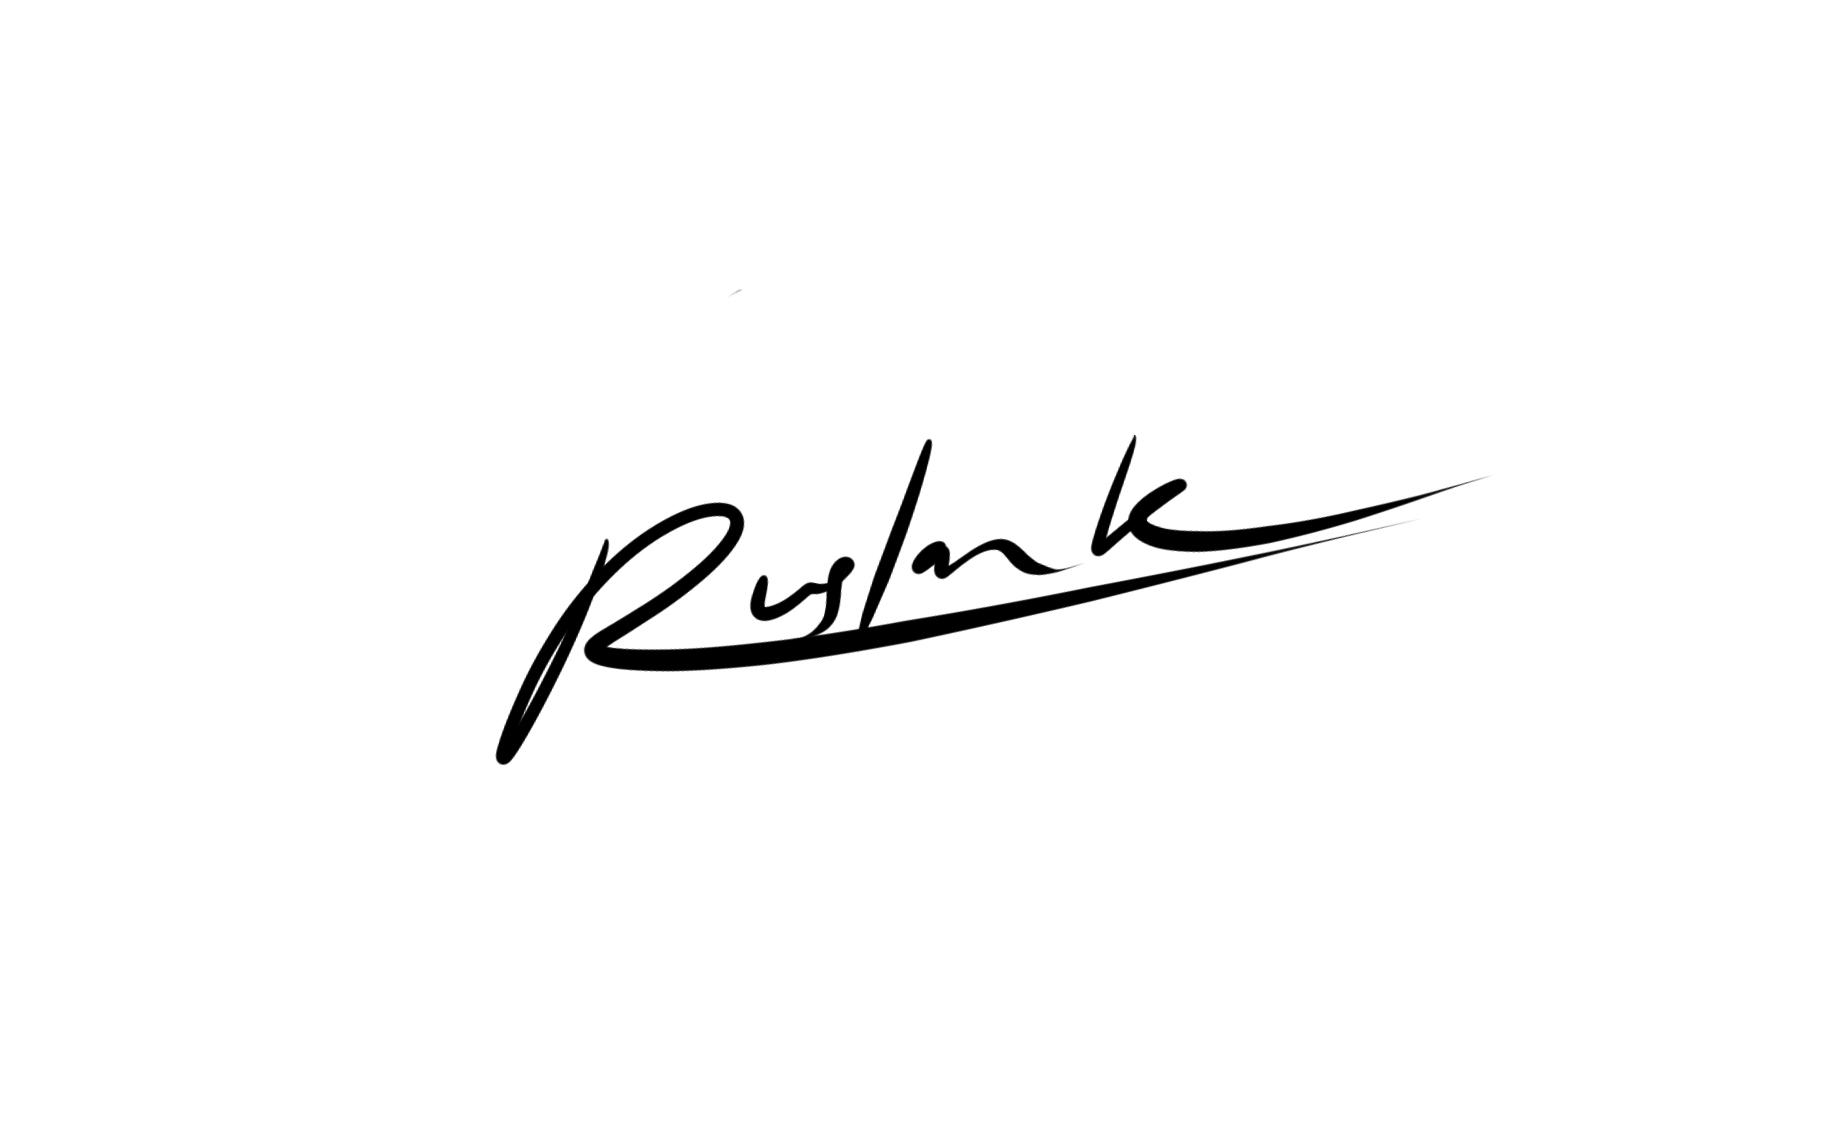 Ruslan Kurmaniattafa'ul's Signature